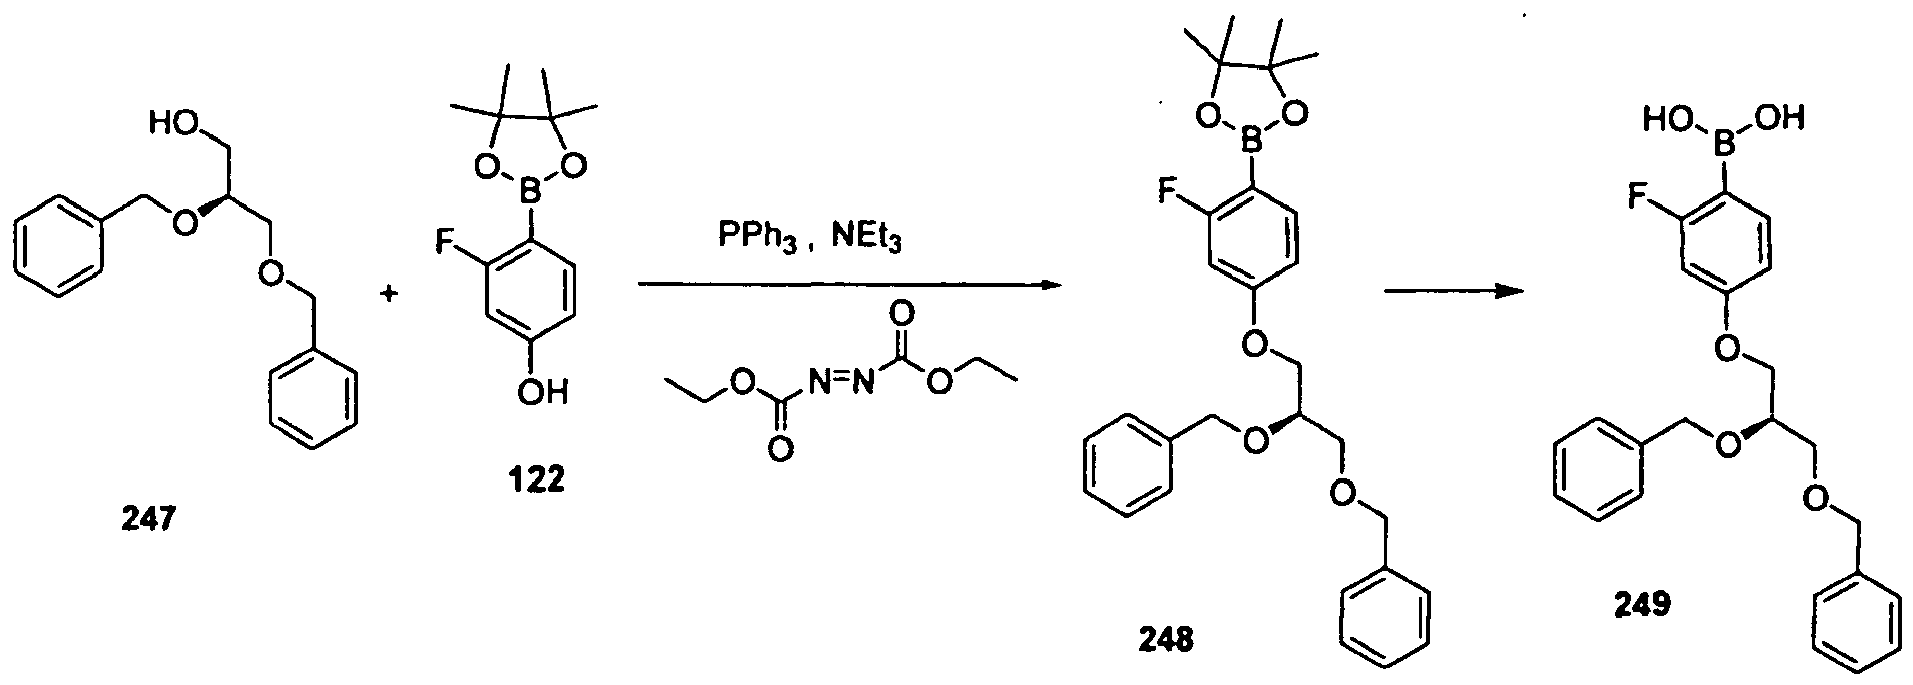 Figure imgb0853